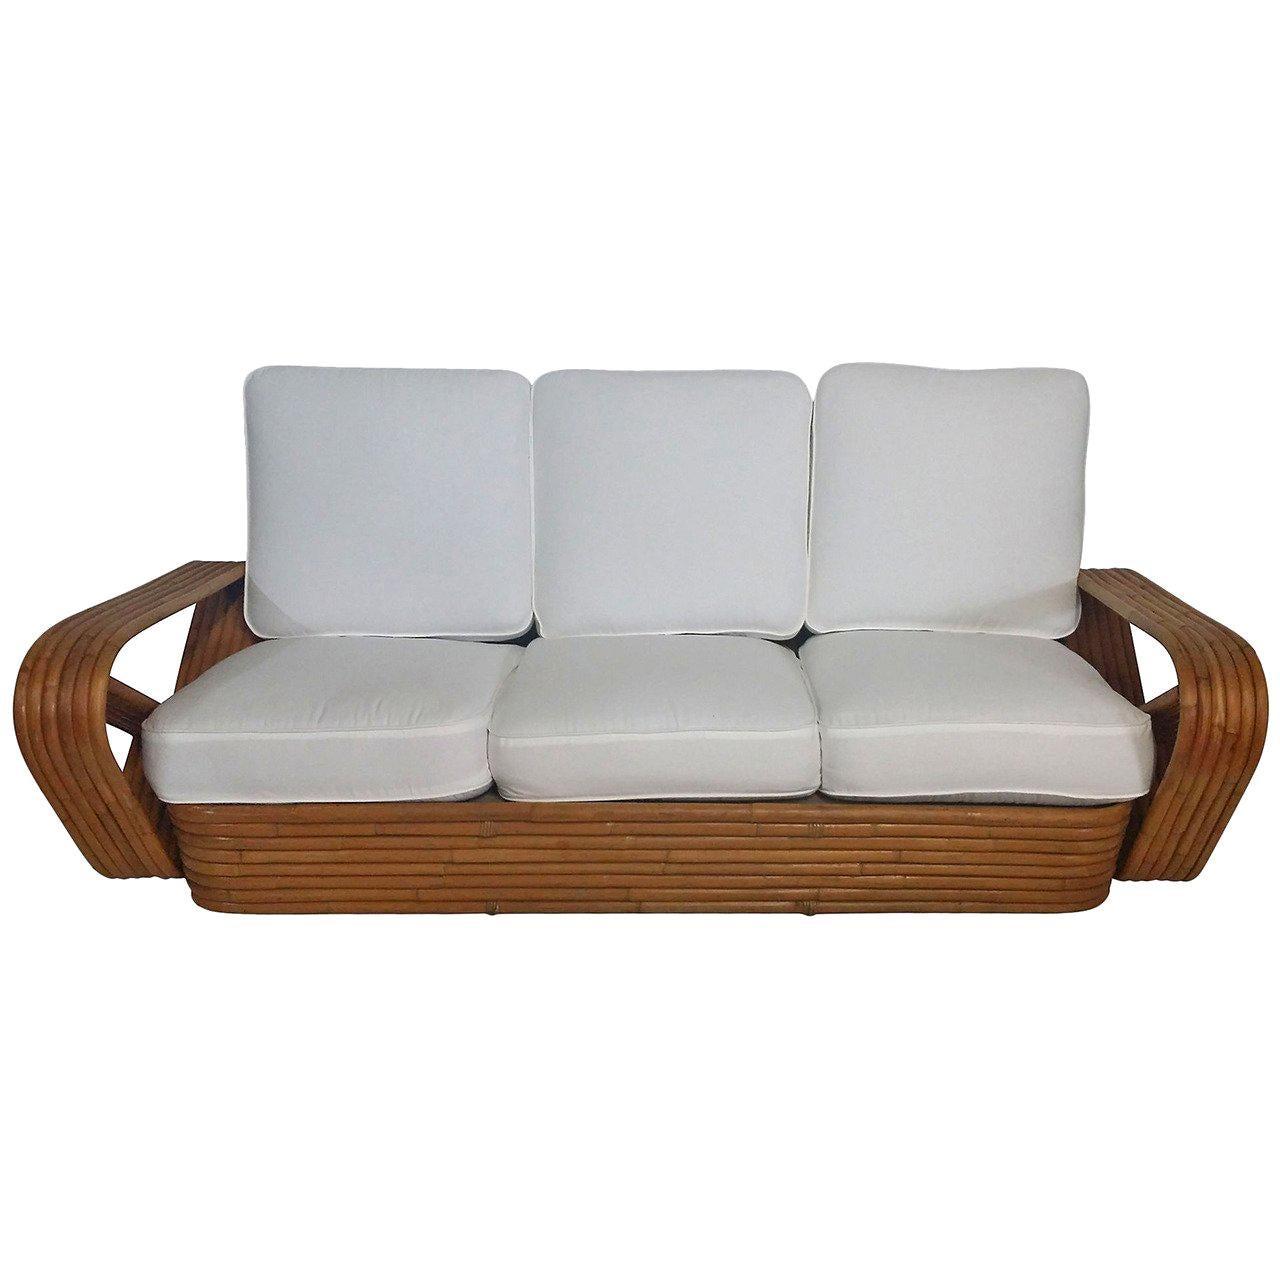 Restored 1930s Six-Strand Square Pretzel Sofa in the Manner of Paul Frankl